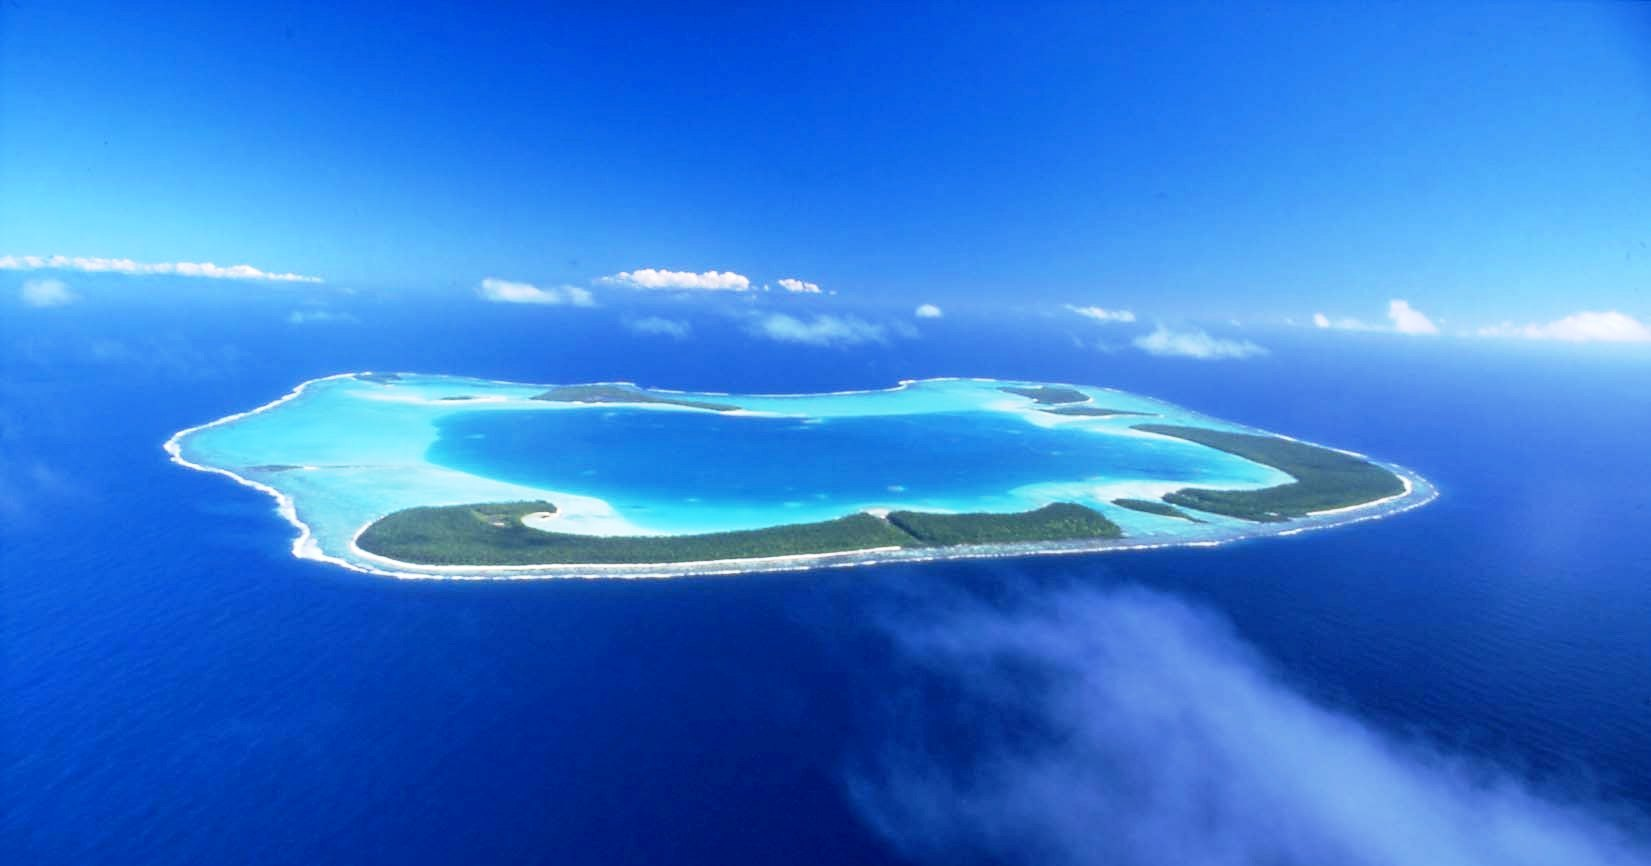 Election de miss Monde: tahiti news tous derrière Hinarere ...: http://shizuo.cc/shizuo/tahiti+news